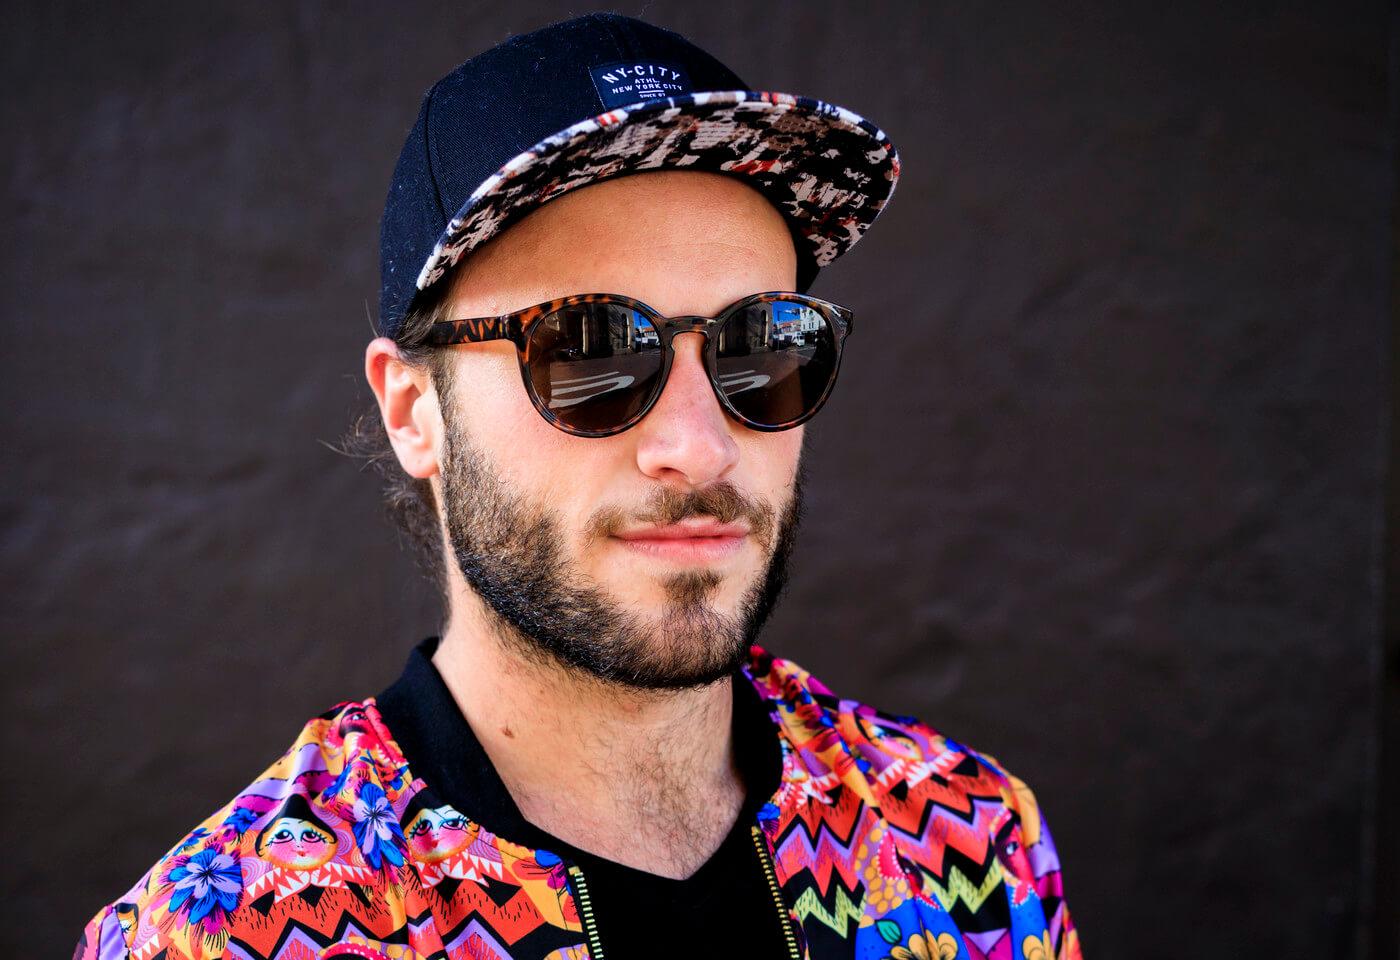 Portrait of man on street wearing sunglasses